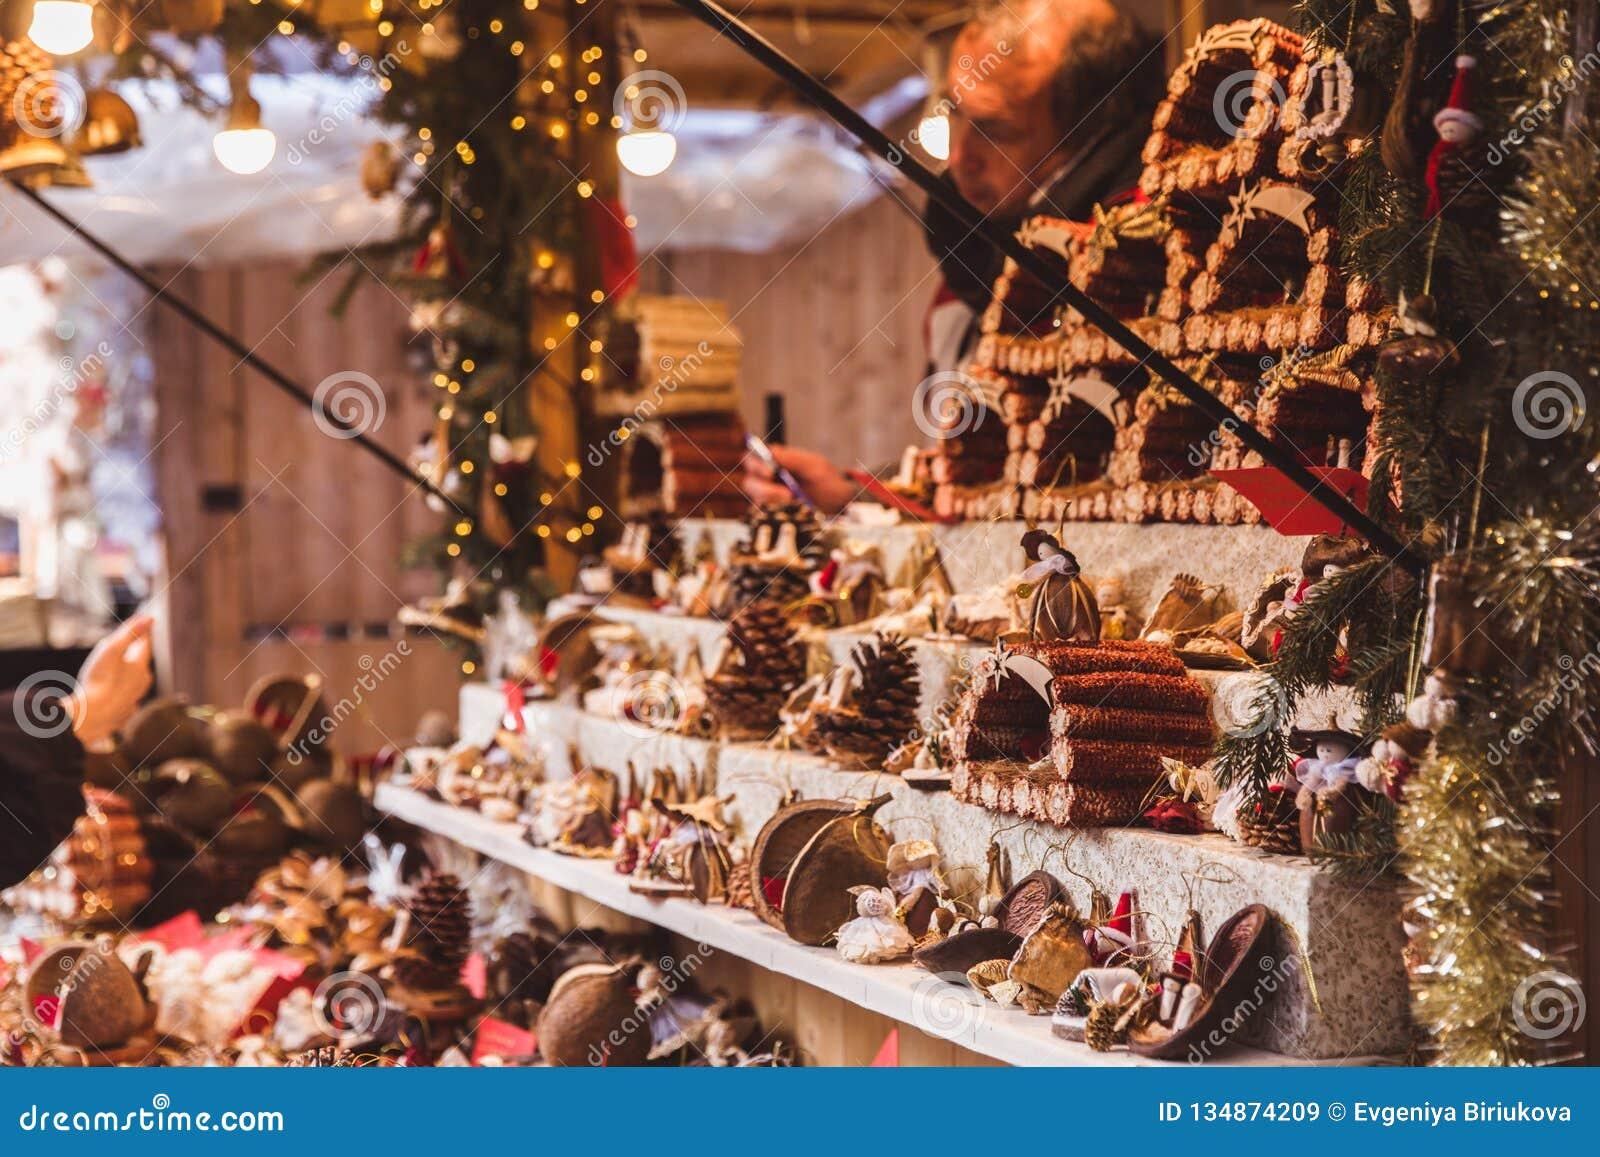 Budapest Christmas Market 2018.Budapest Hungary December 19 2018 Tourists And Local